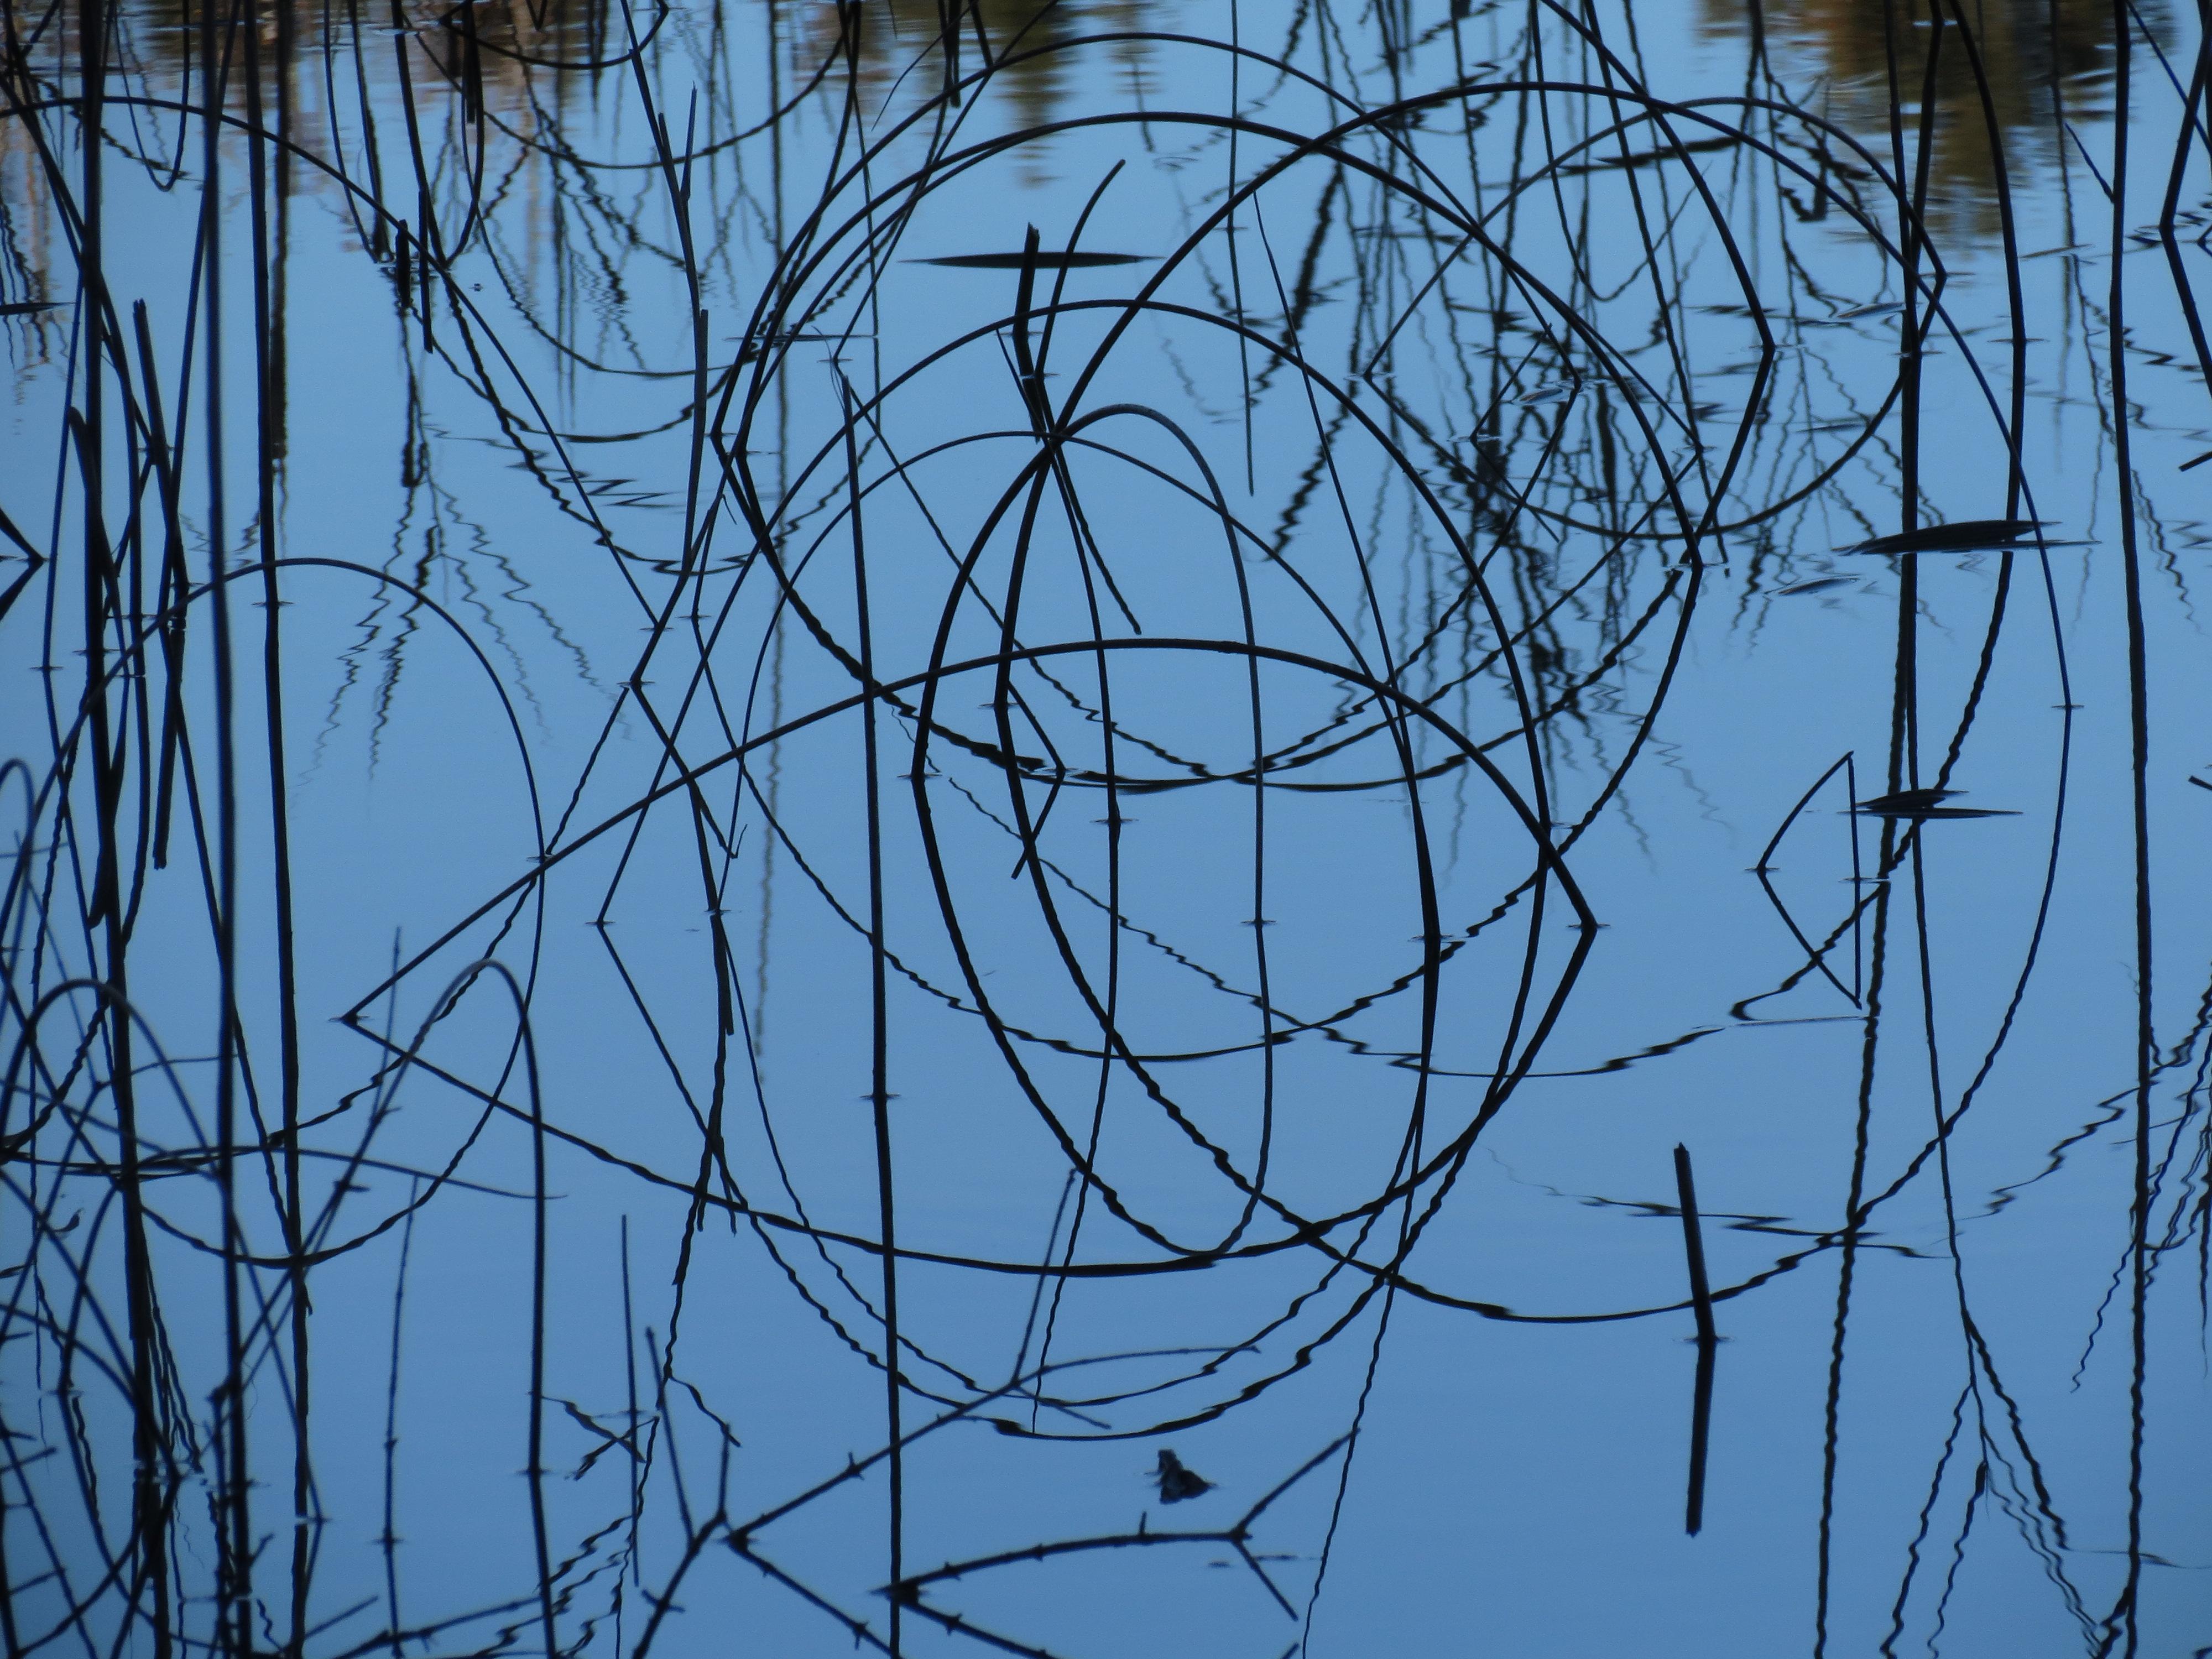 Composition en fil d'herbe